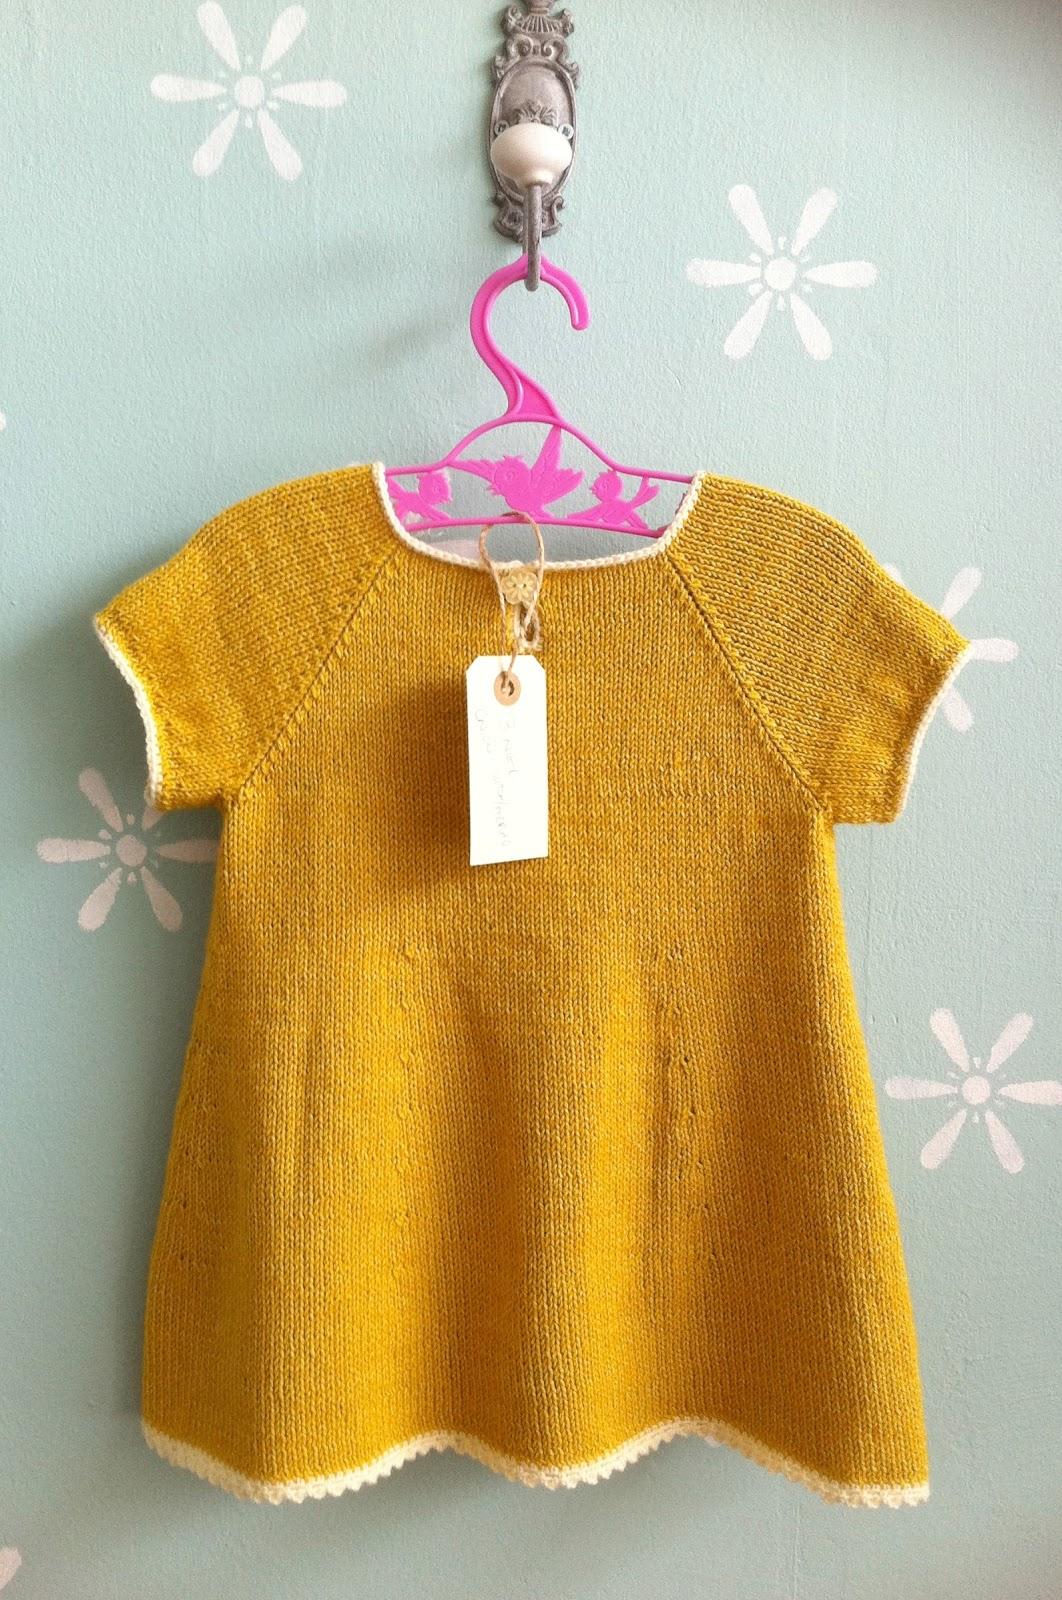 Knitting Pattern Baby Girl Dress : erleperle: peachy dress